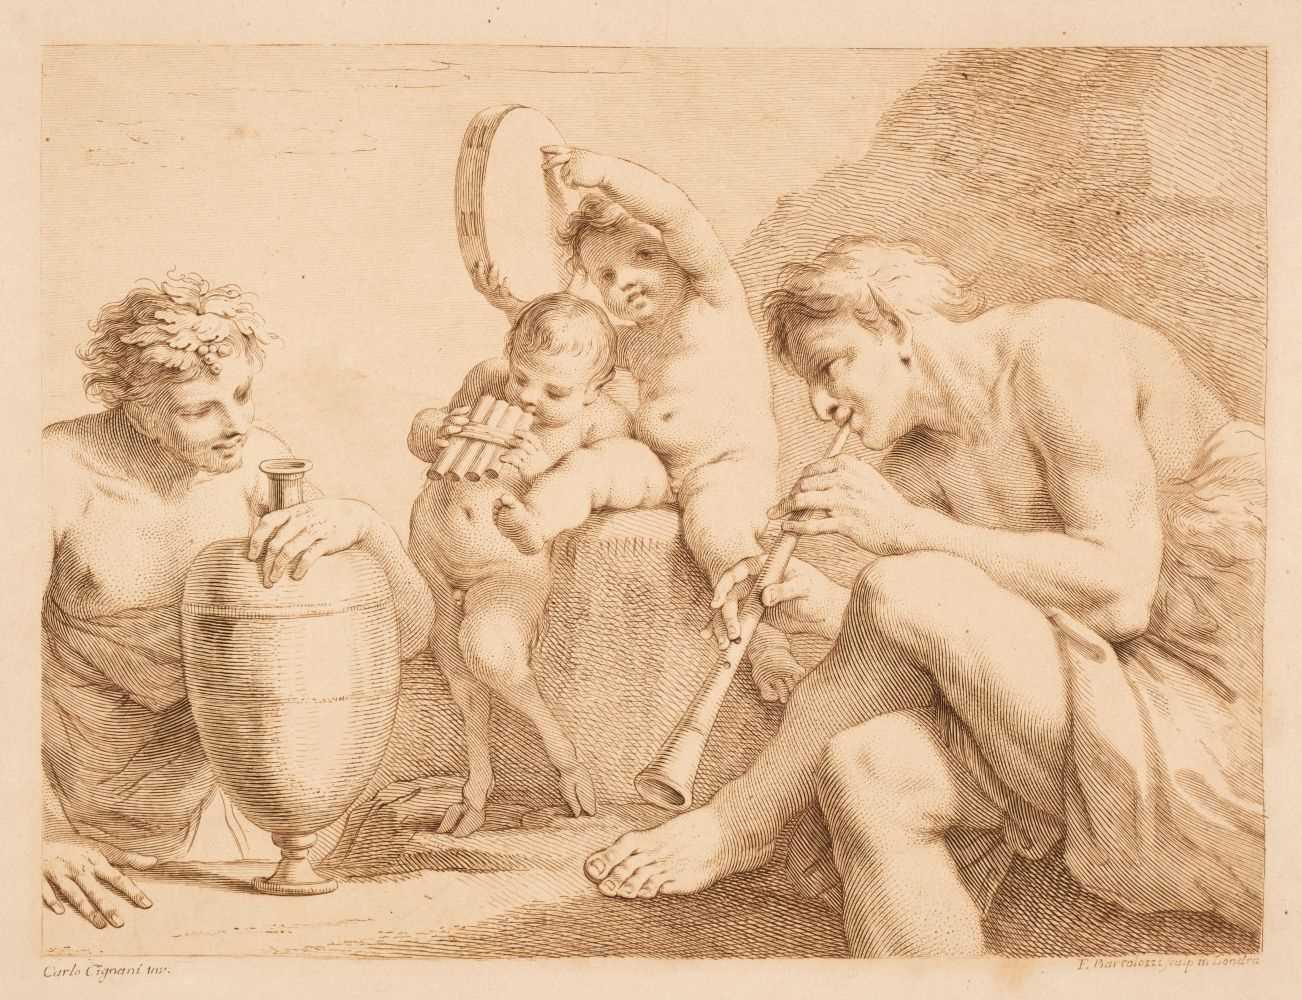 Lot 369 - Bartolozzi (Francesco). Eighty-Two [Seventy-three] Prints..., 2 vols., c.1800